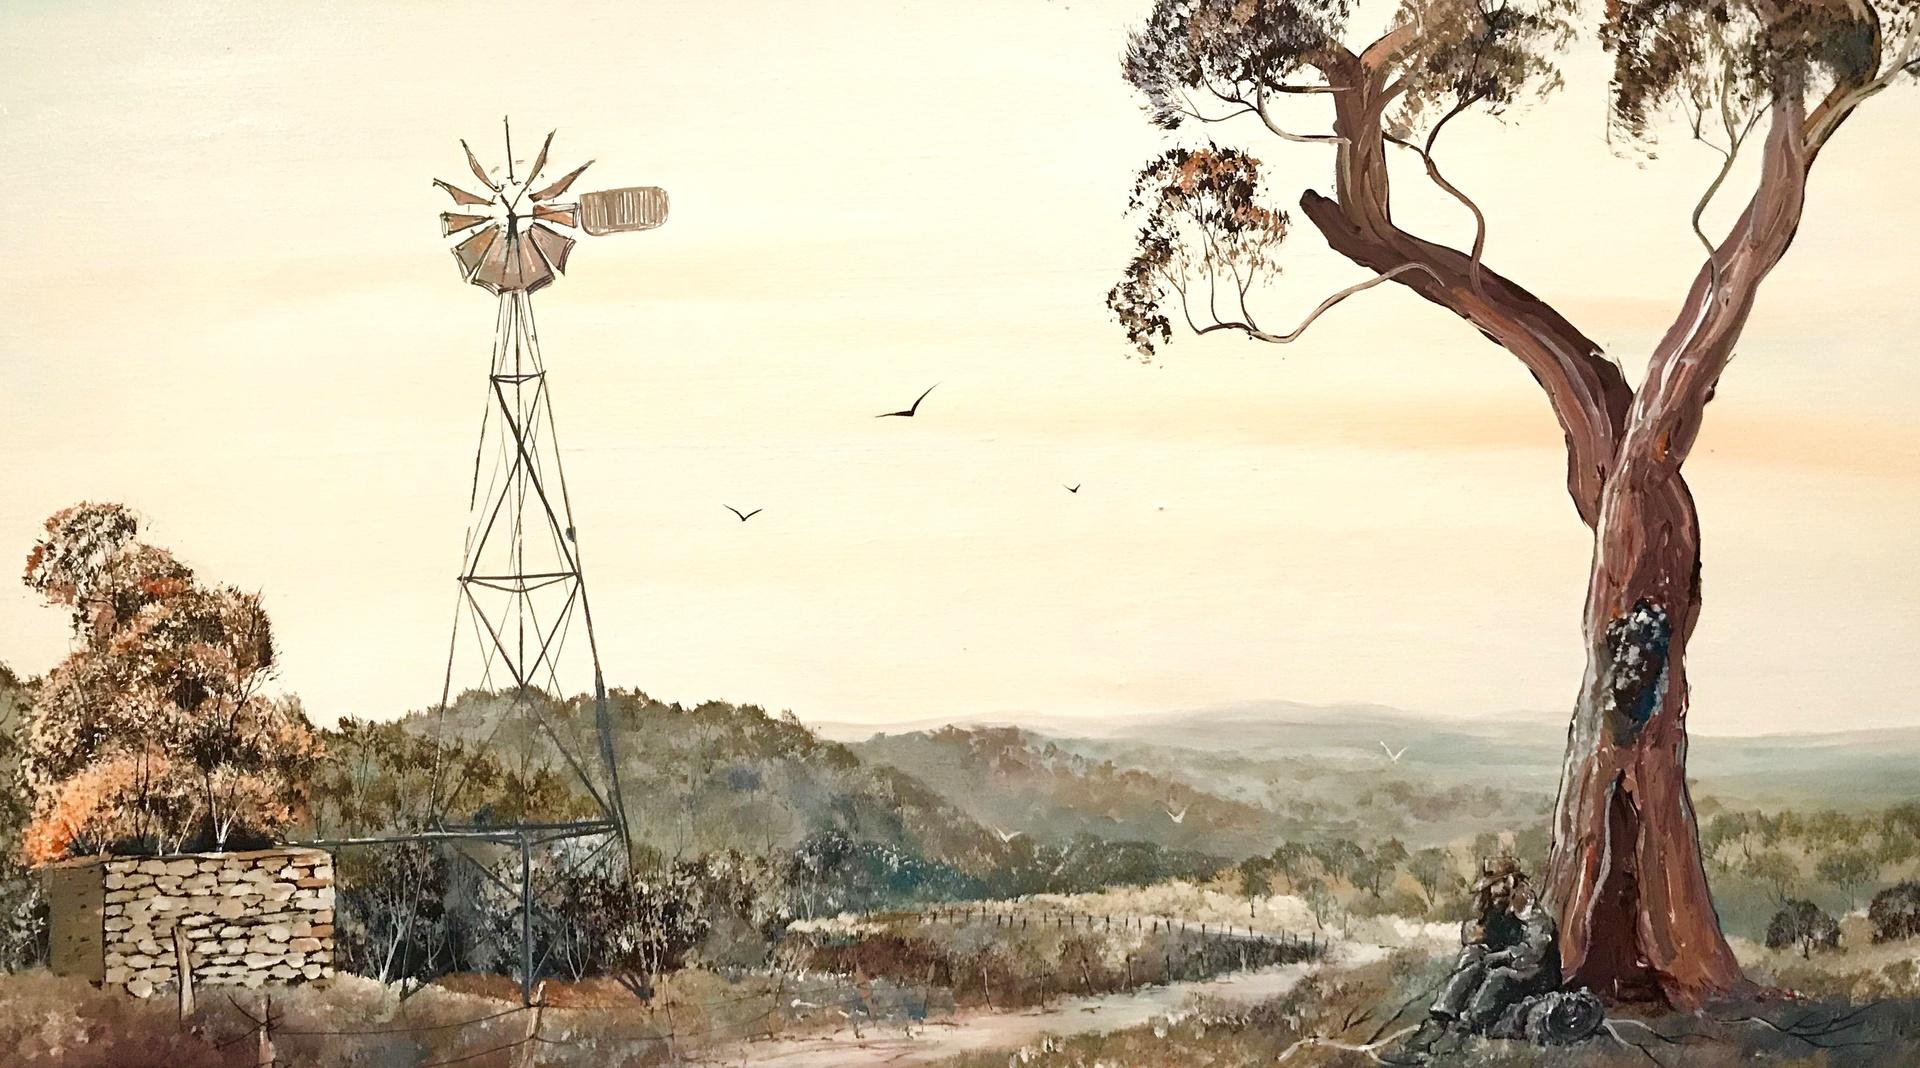 The life of a Swagman - Acrylic on Canvas